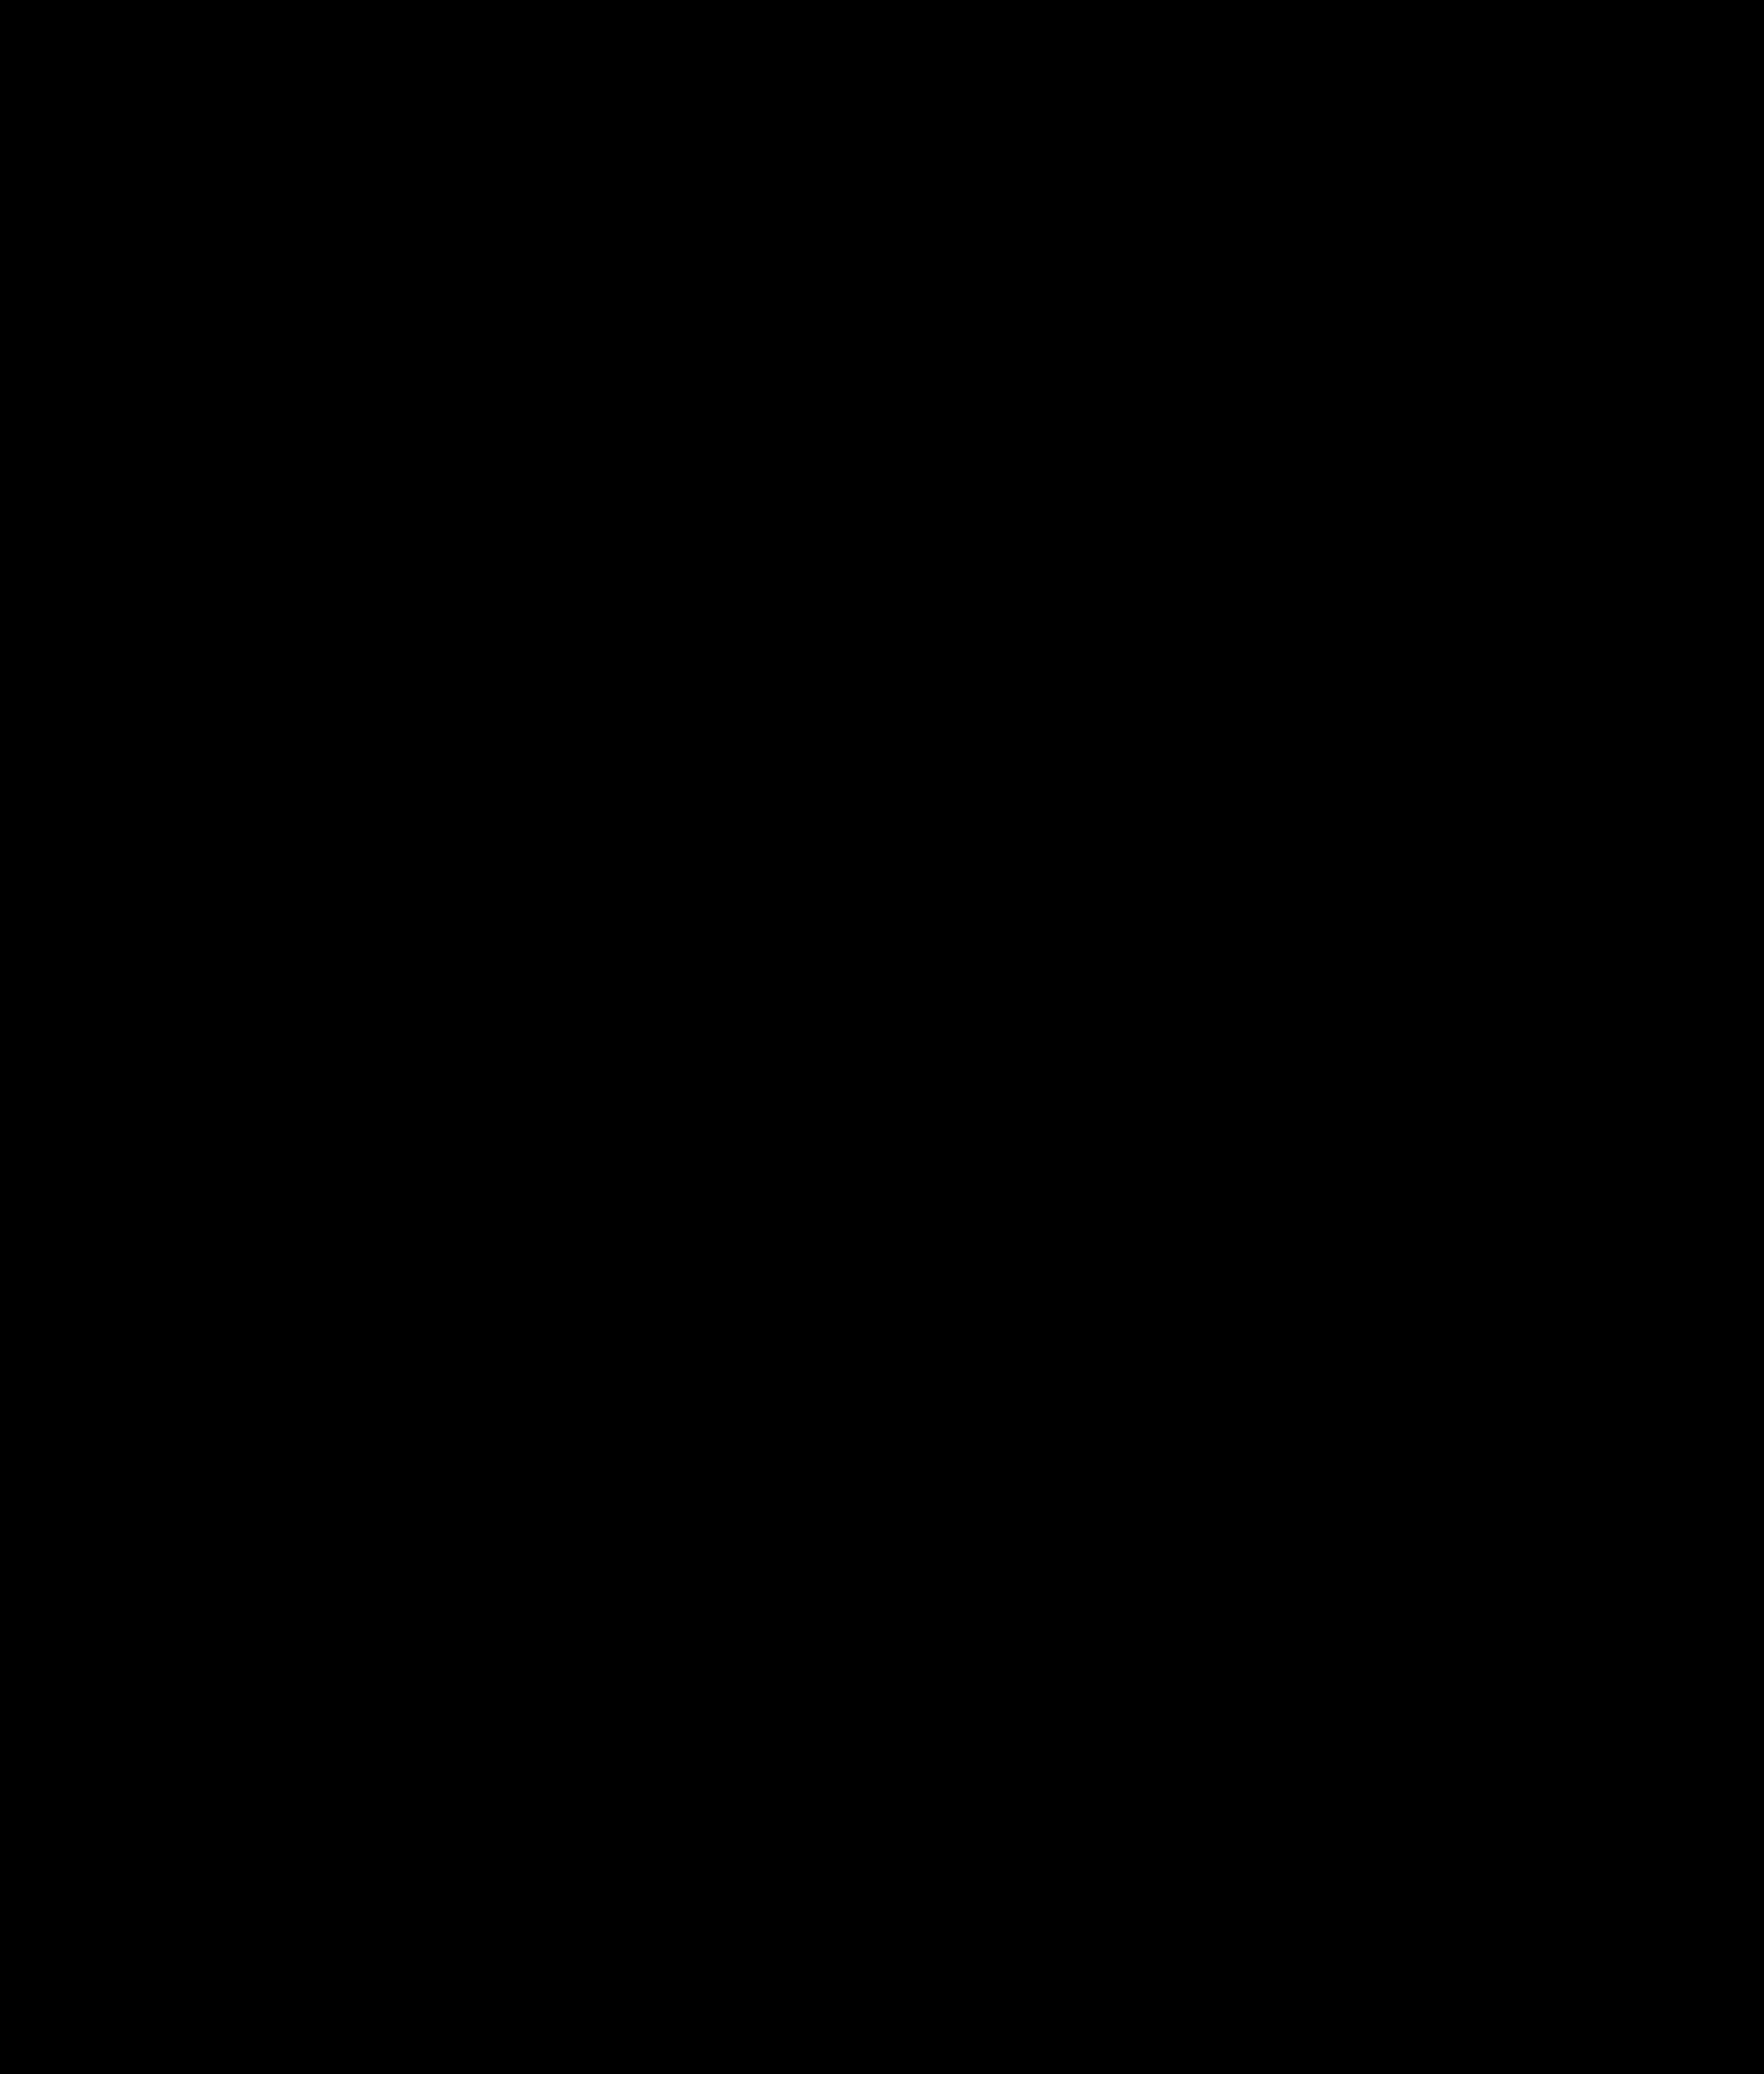 2041x2400 Clipart